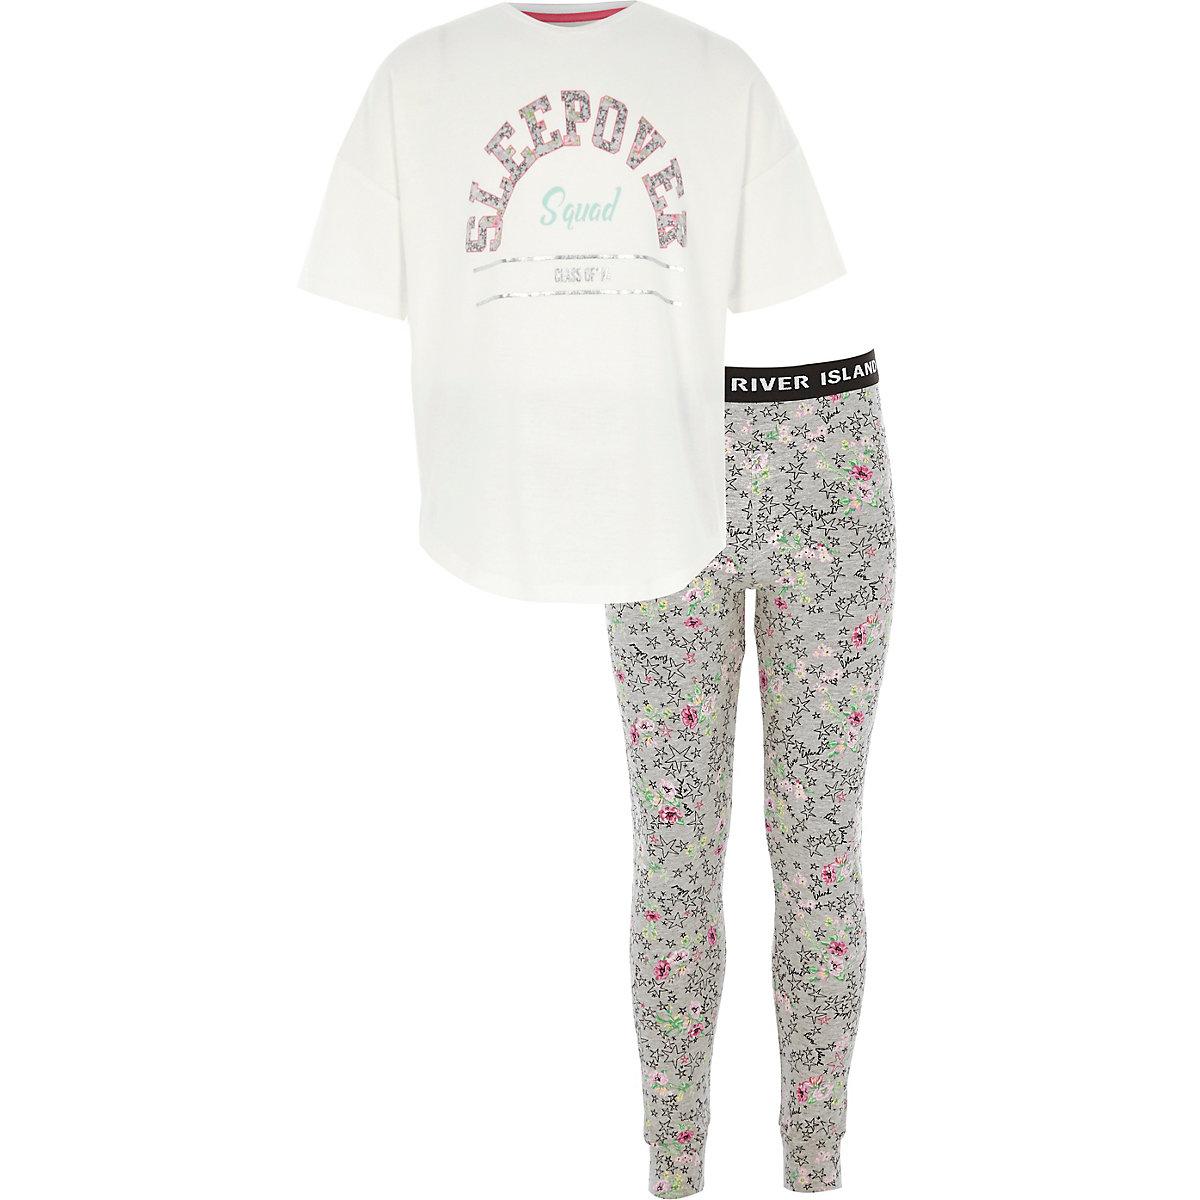 Girls grey 'sleepover' pajama leggings set